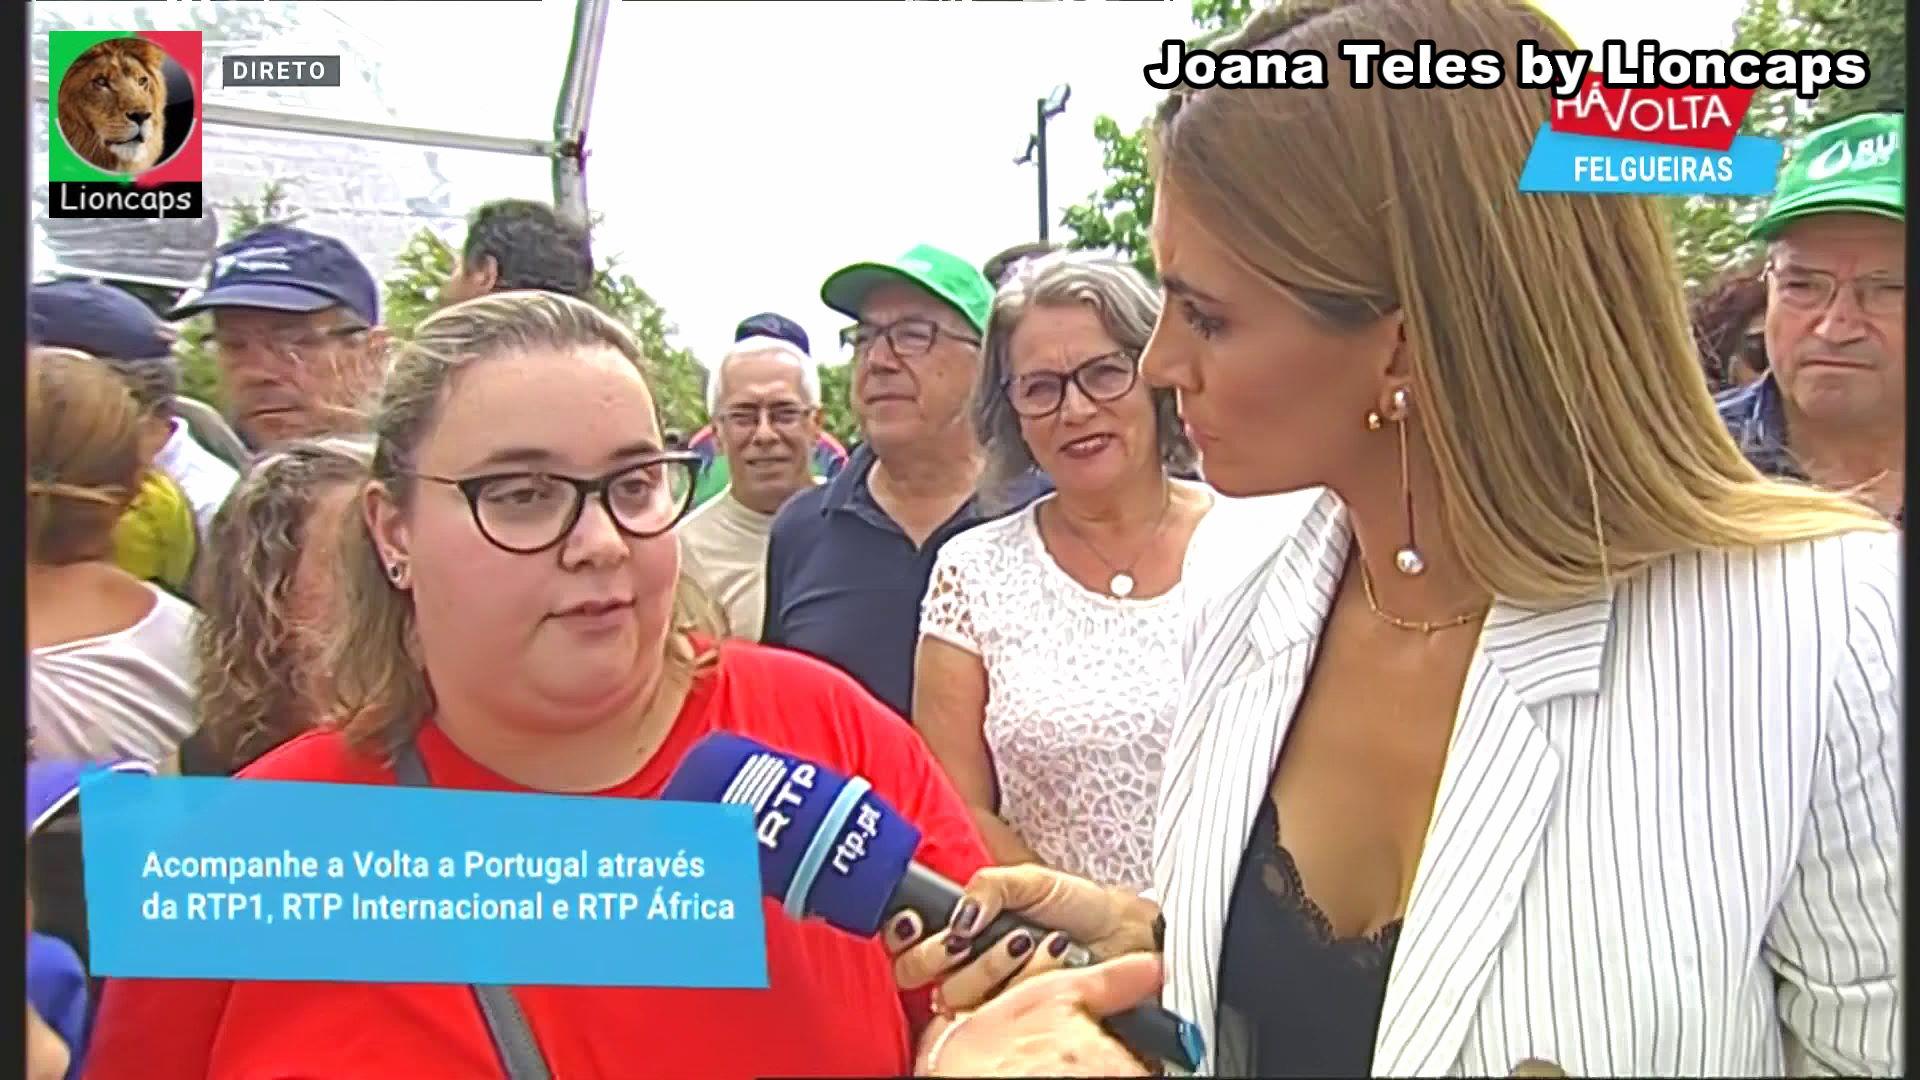 976685953_joana_teles_vs200125_11616_122_76lo.JPG